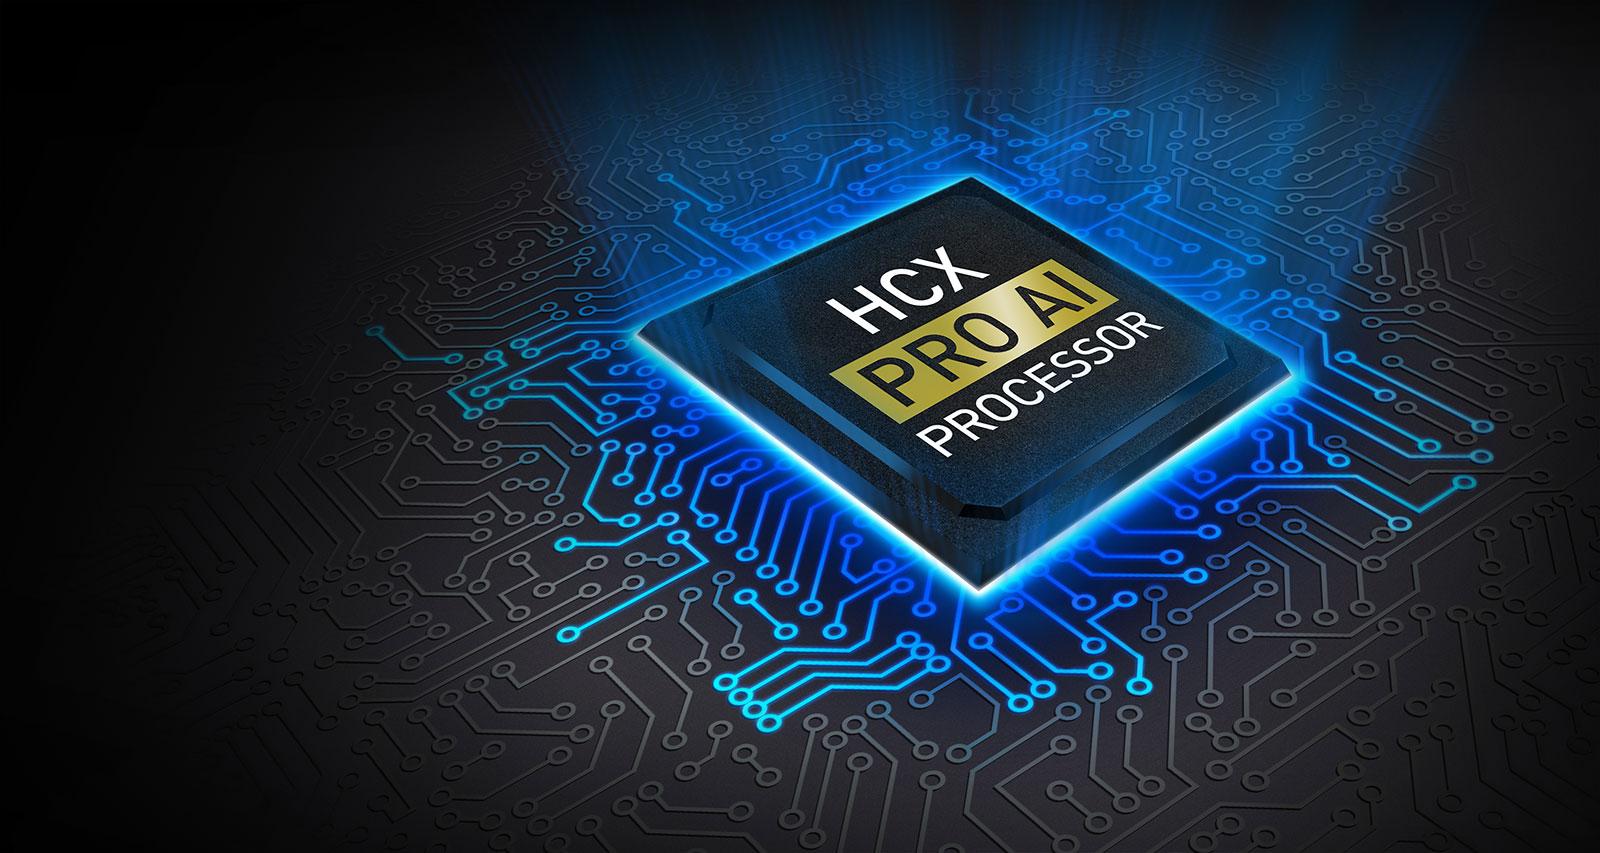 Panasonic HCX Pro AI Processor